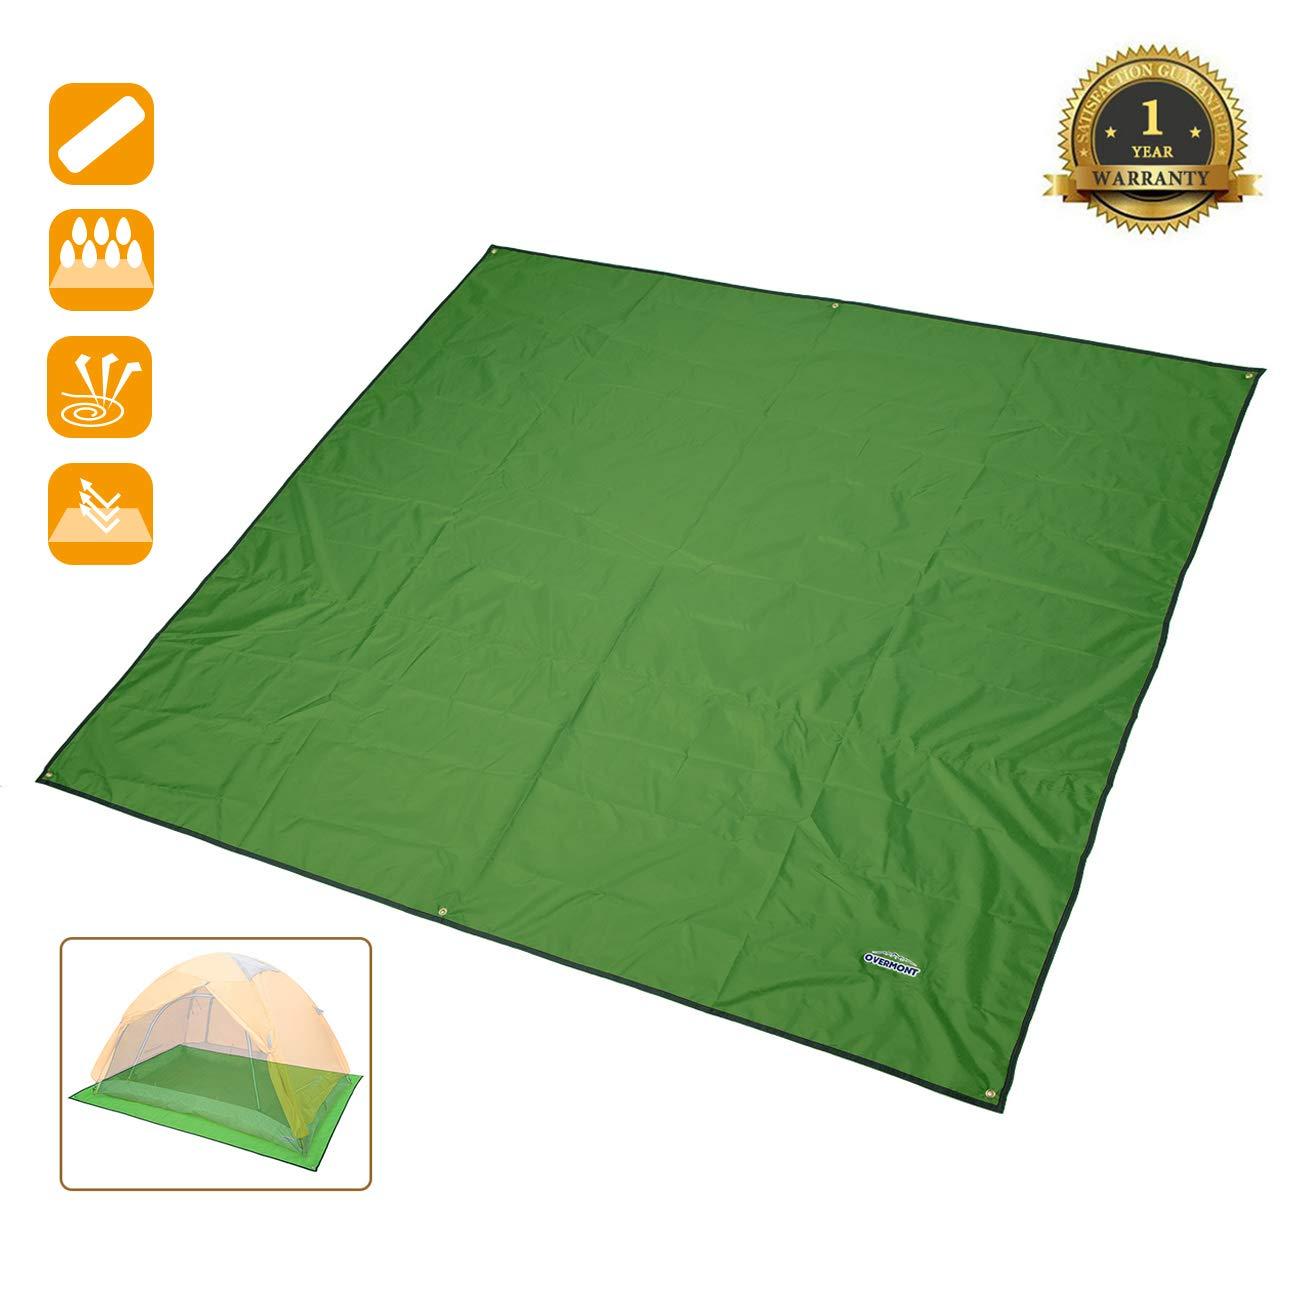 Overmont estera toldo alfombrilla manta impermeable plegable con bolsa para tienda de campa/ña camping picnic playa senderismo al aire libre azul//naranja//verde//verde oscuro